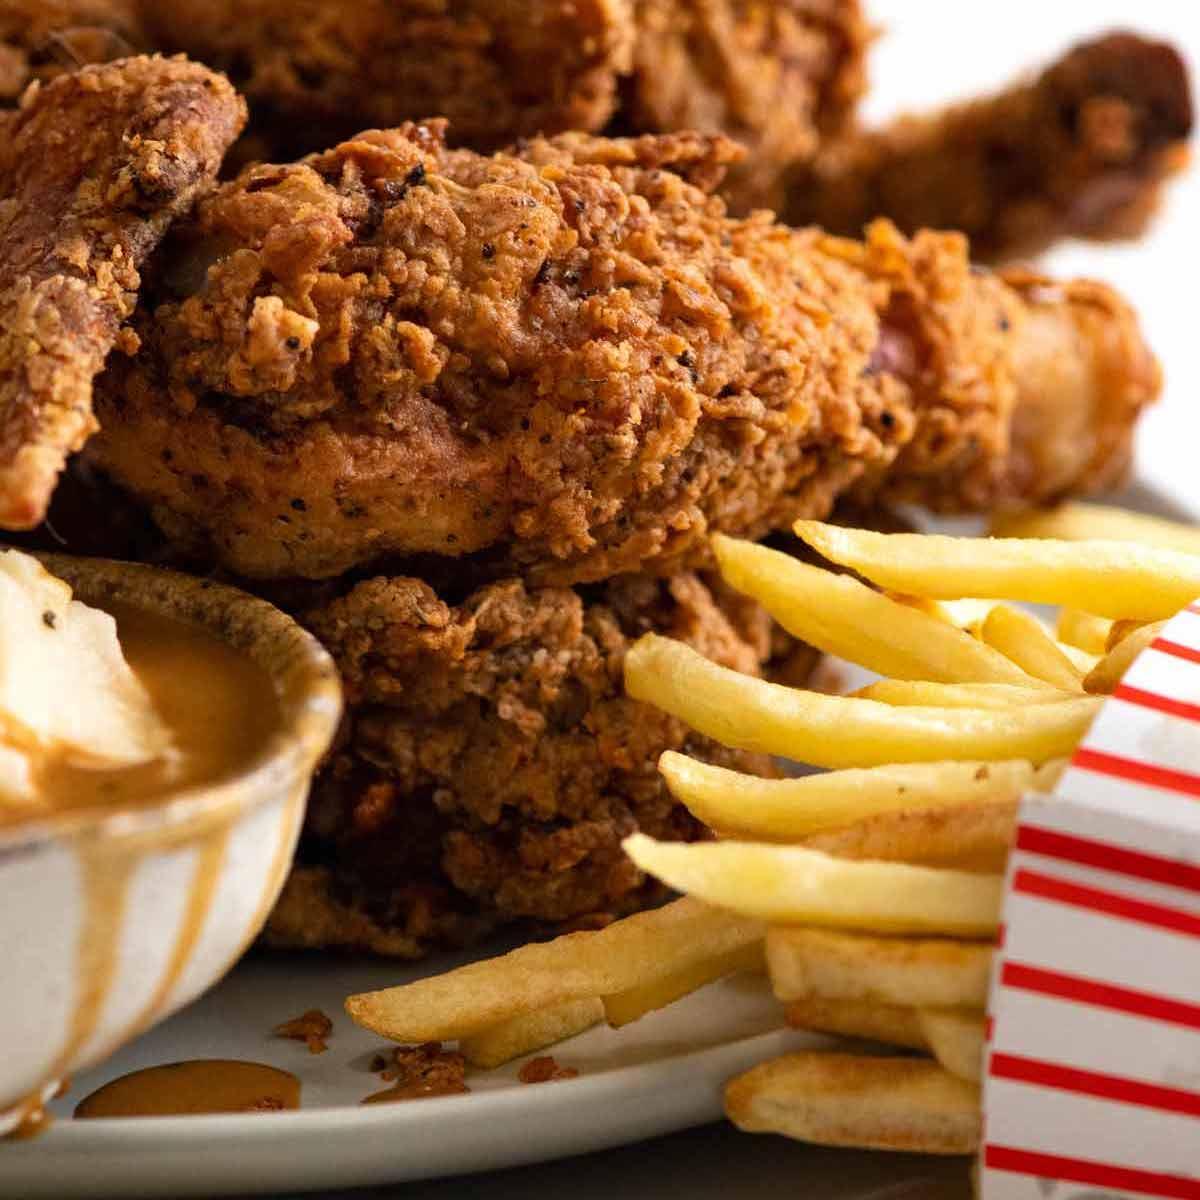 Fried Chicken mana yang paling enak di dunia?'s Image